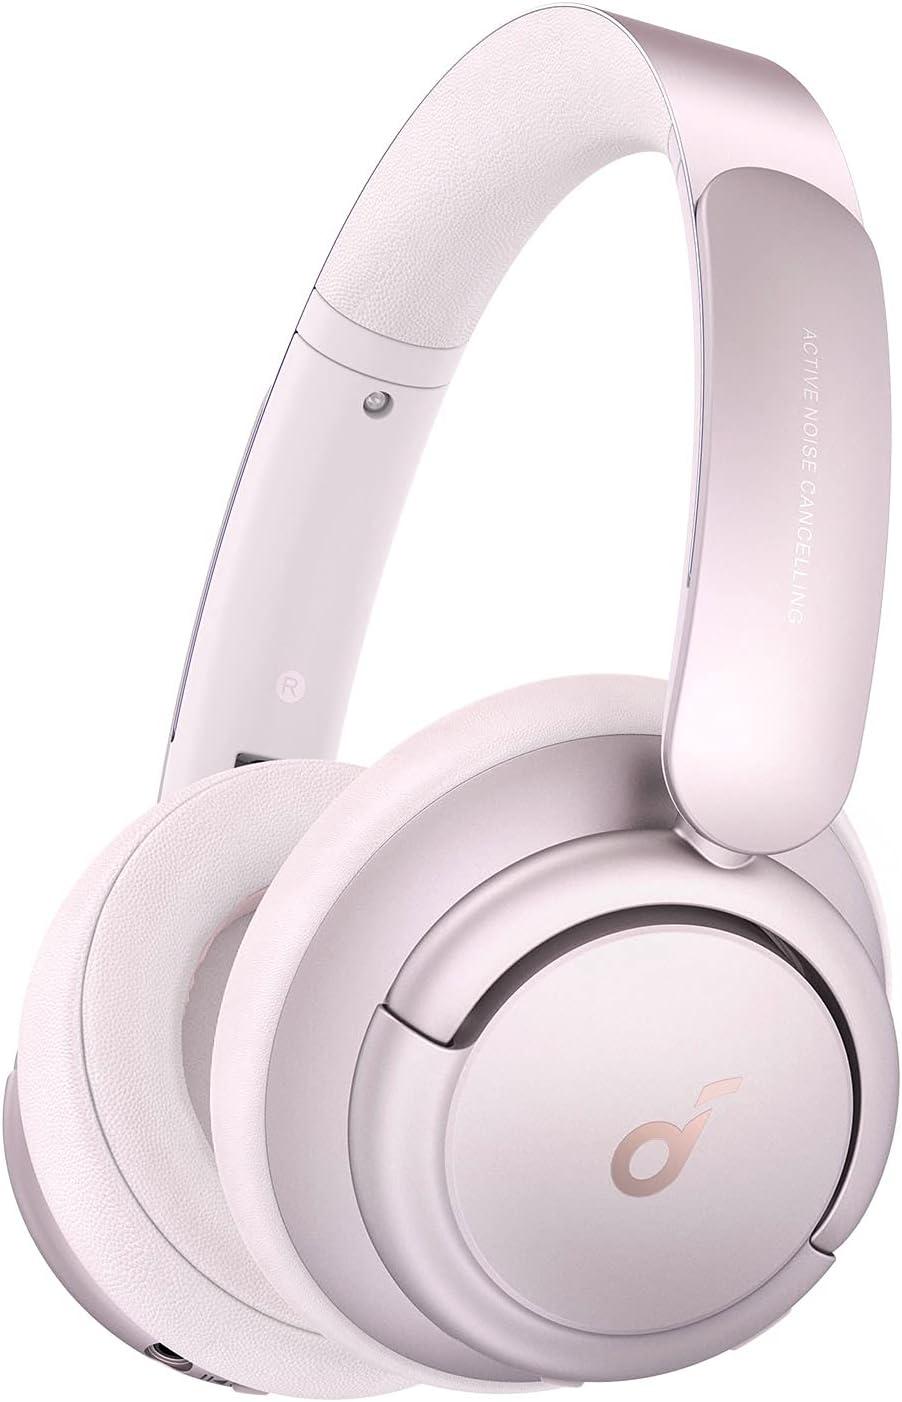 Anker Soundcore Life Q35(Bluetooth5.0 ワイヤレス ヘッドホン)【LDAC対応 / ウルトラノイズキャンセリング / ハイレゾ対応 (ワイヤレス / 有線) / 外音取り込みモード / NFC・Bluetooth対応 / 最大40時間音楽再生 / マイク内蔵 / 専用アプリ対応】ピンク